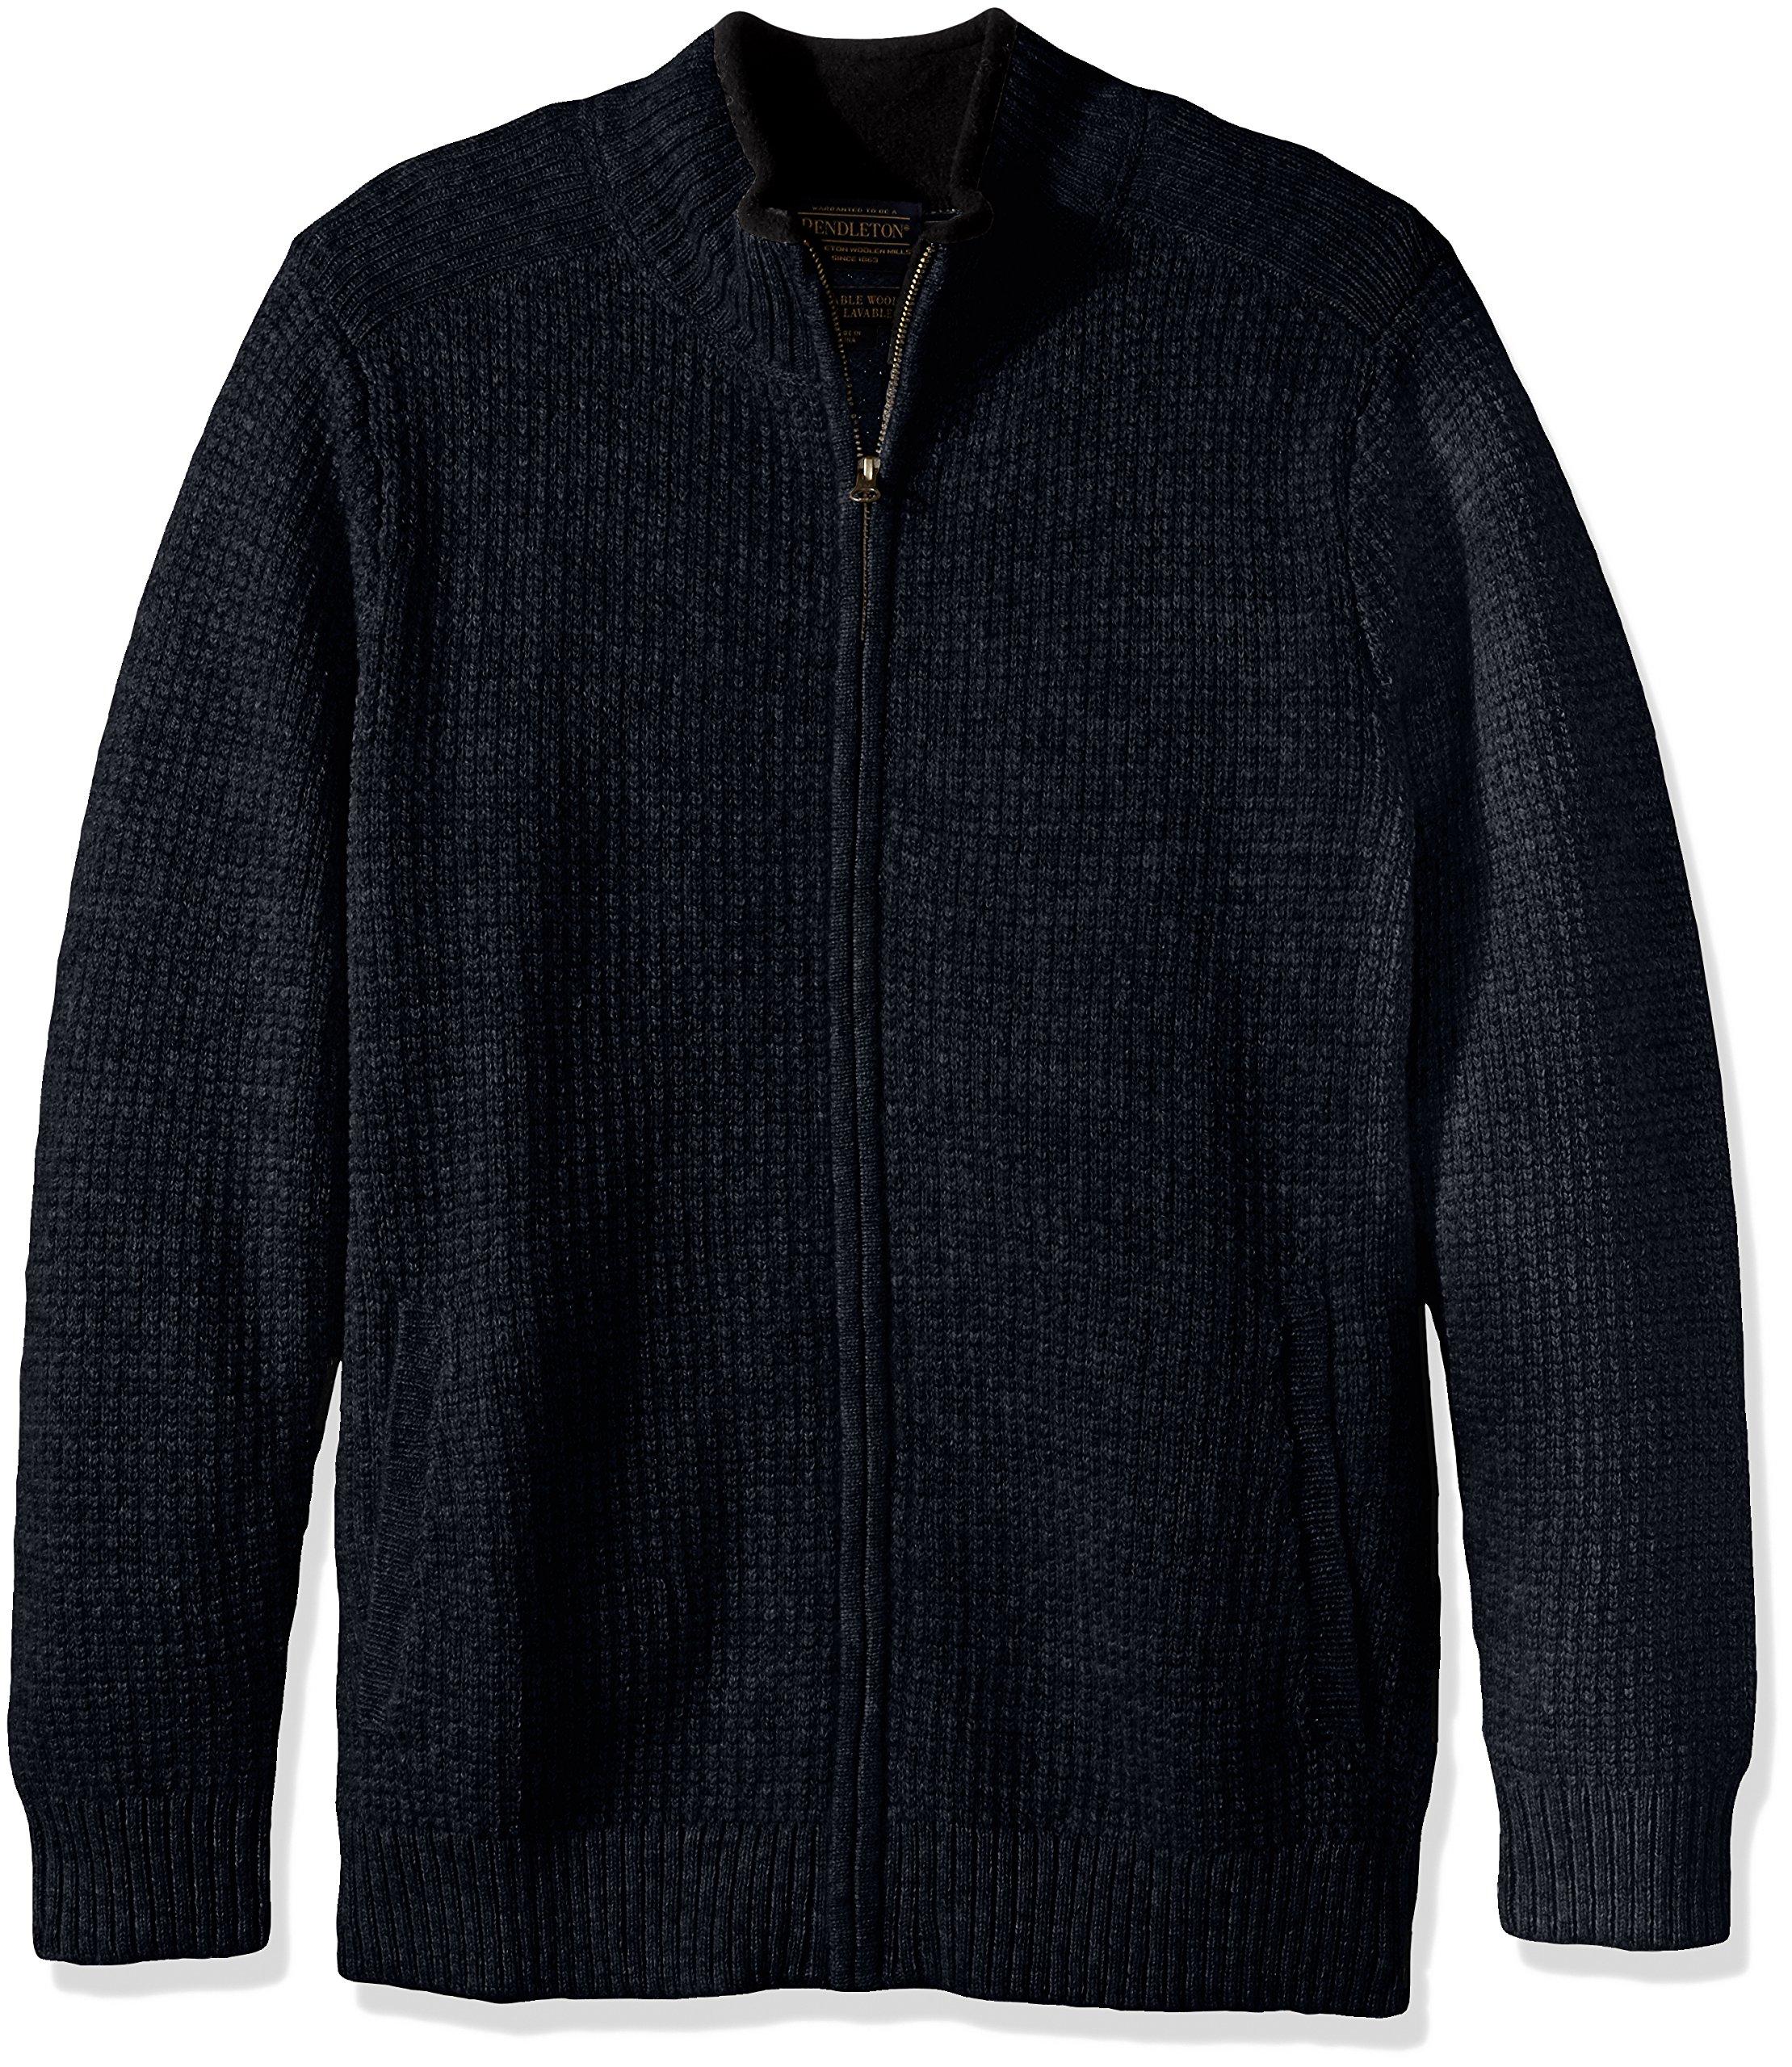 Pendleton Men's Shetland Full-Zip Cardingan Sweater, Indigo Heather-63630, MD